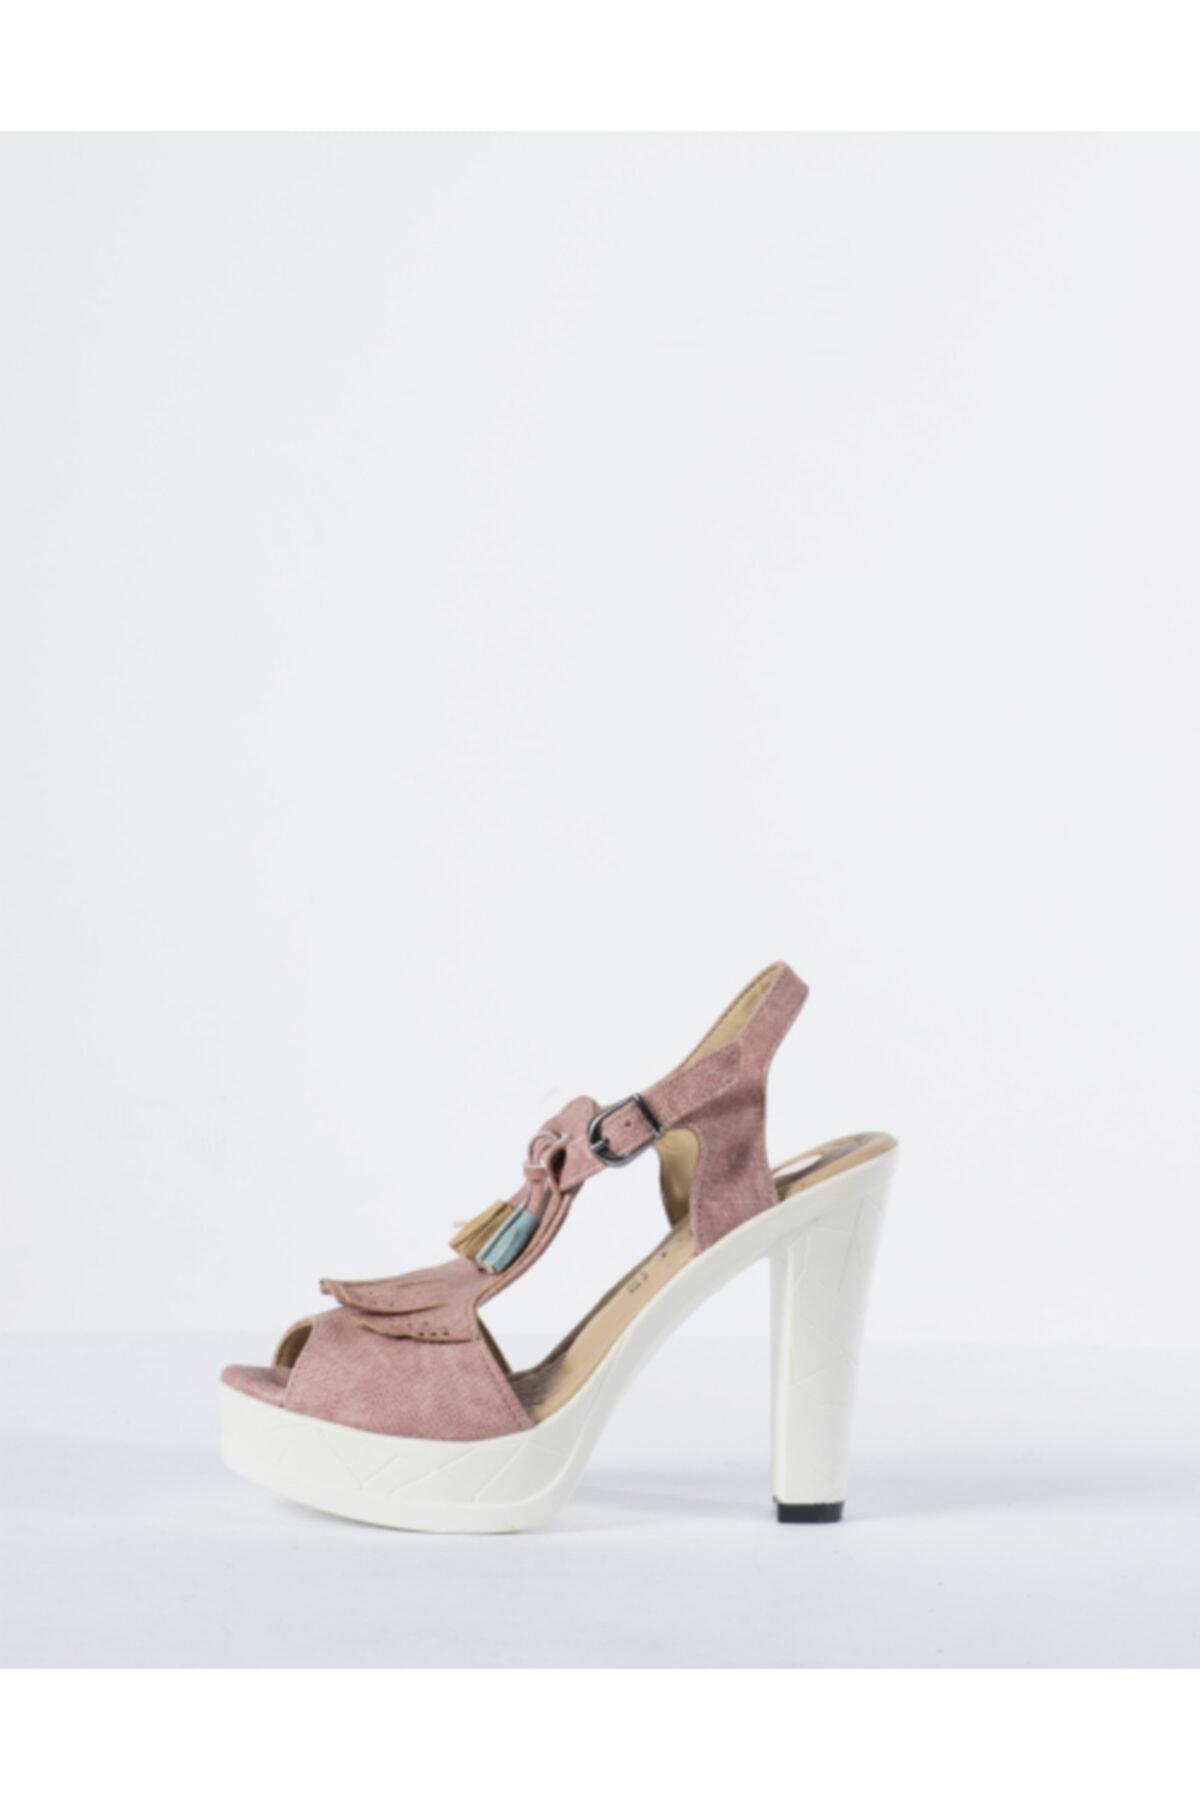 Vision Kadın Pembe Topuklu Ayakkabı 1